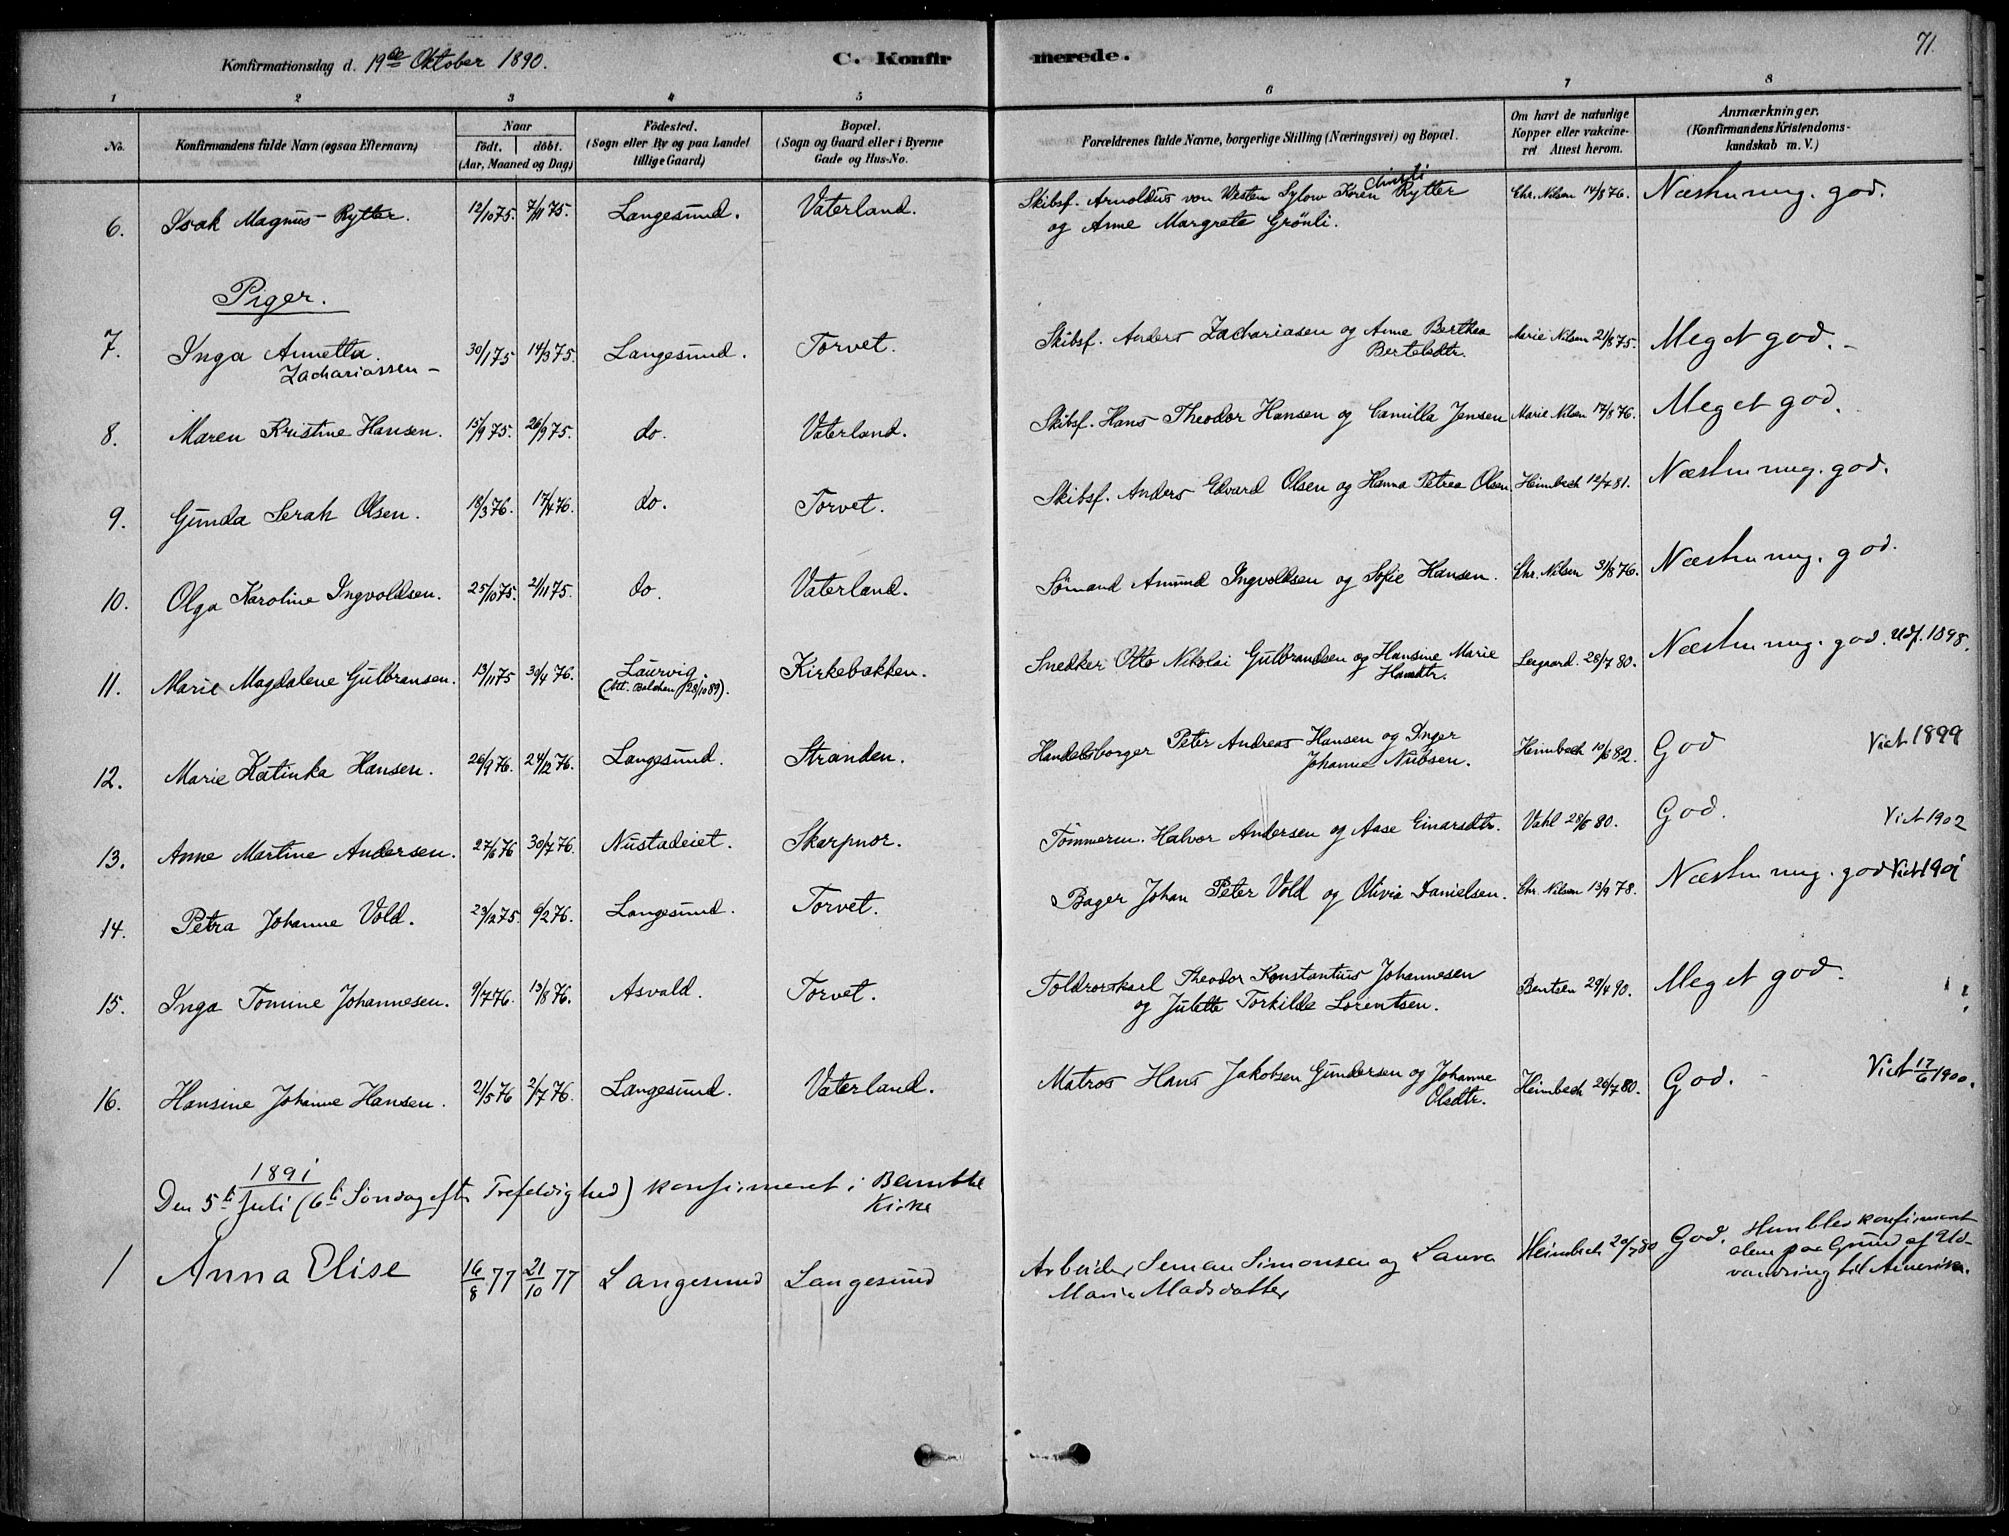 SAKO, Langesund kirkebøker, F/Fa/L0002: Ministerialbok nr. 2, 1878-1892, s. 71